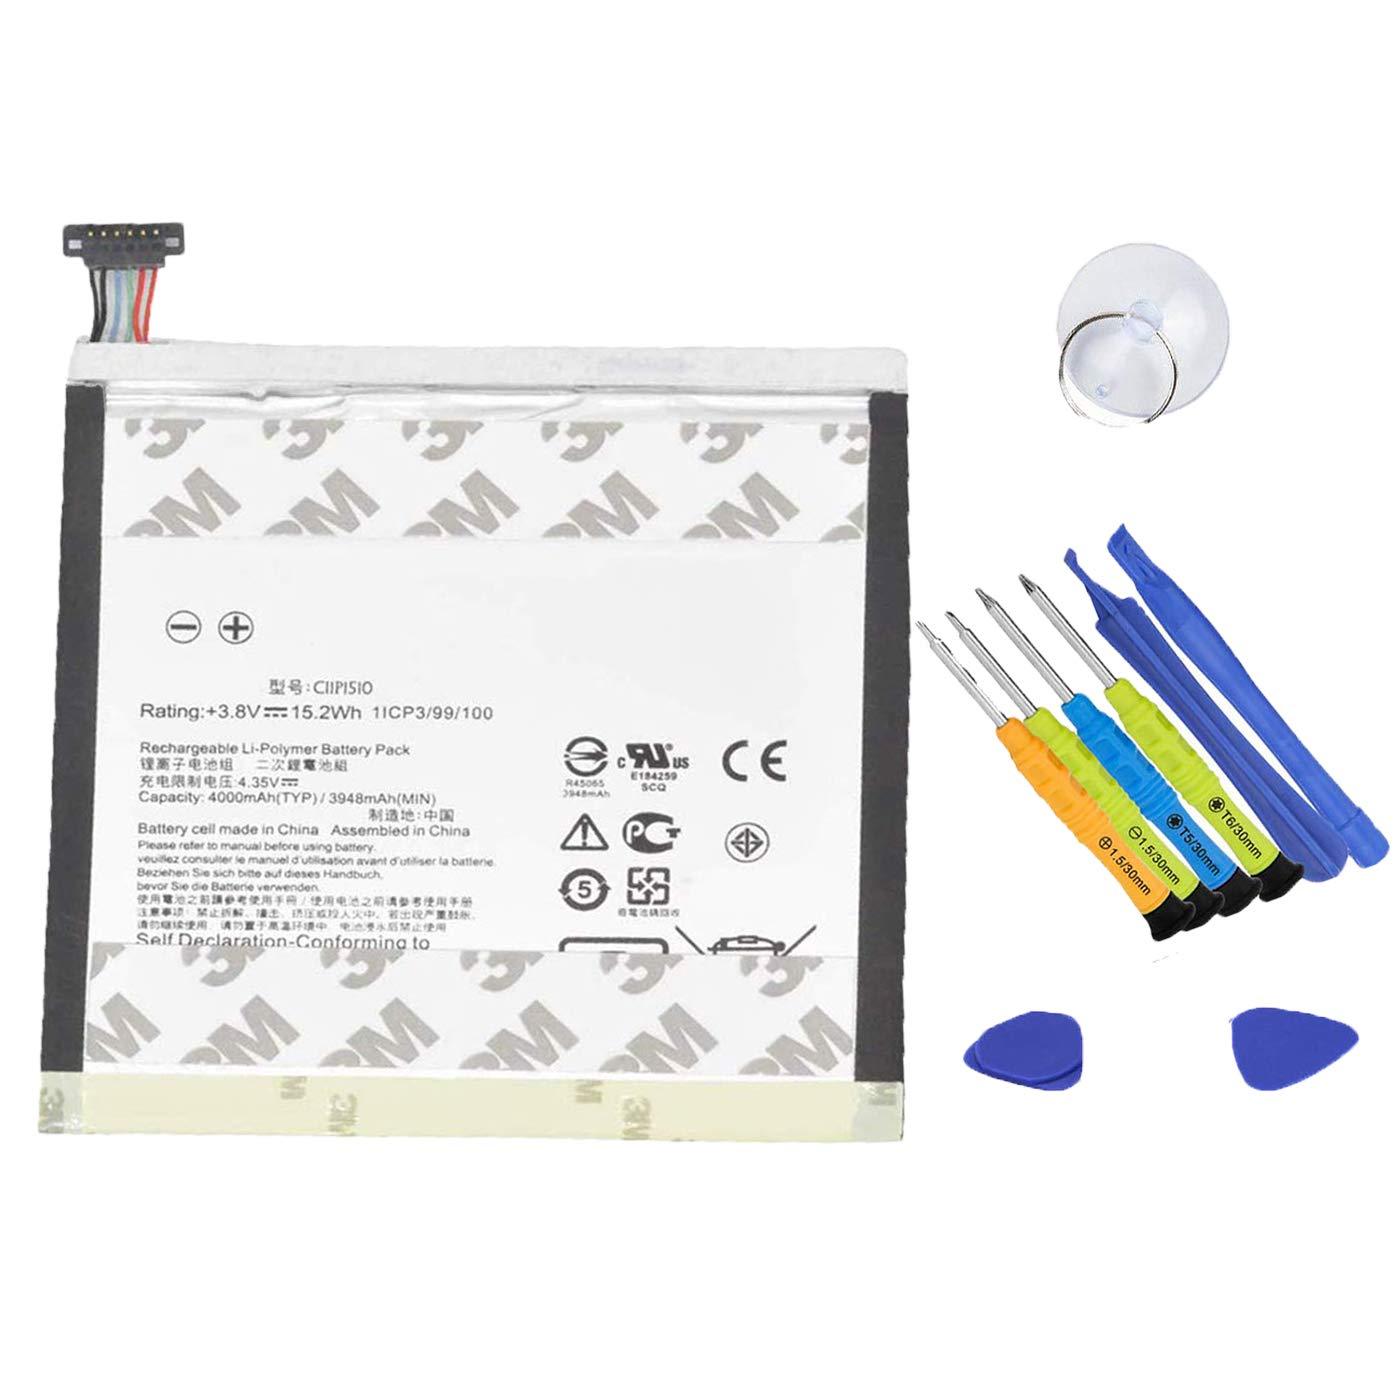 Bateria Asus C11P1510 3.8V 15.2Wh 4000mAh ZenPad S 8.0 Z580C